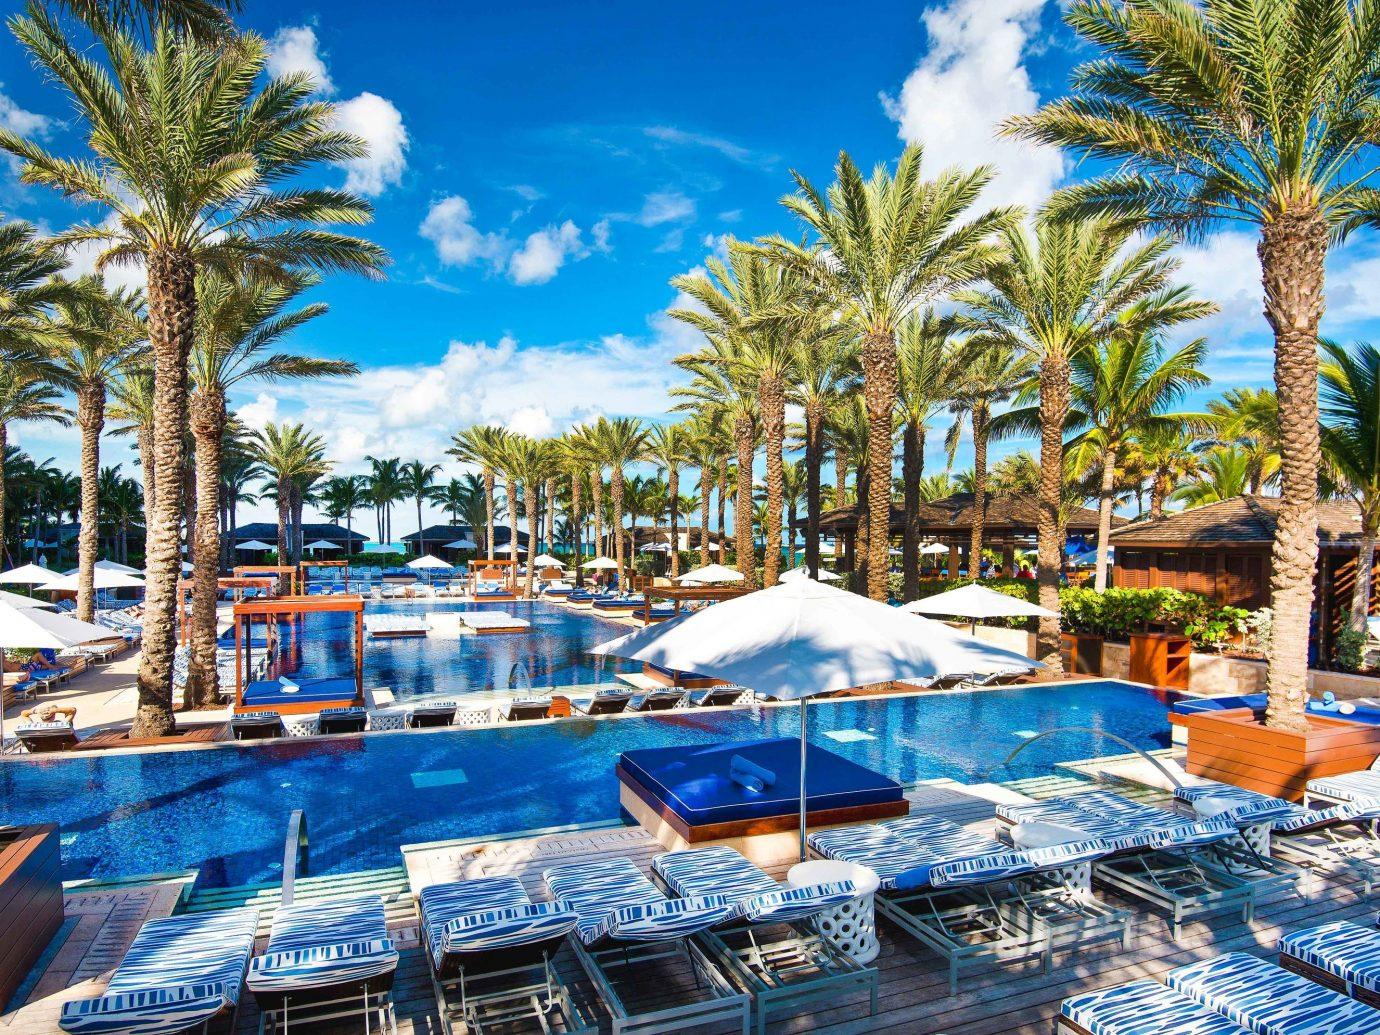 Beach Summer Travel Trip Ideas Resort swimming pool leisure resort town palm tree arecales vacation tourism hotel tree real estate estate tropics Villa caribbean recreation